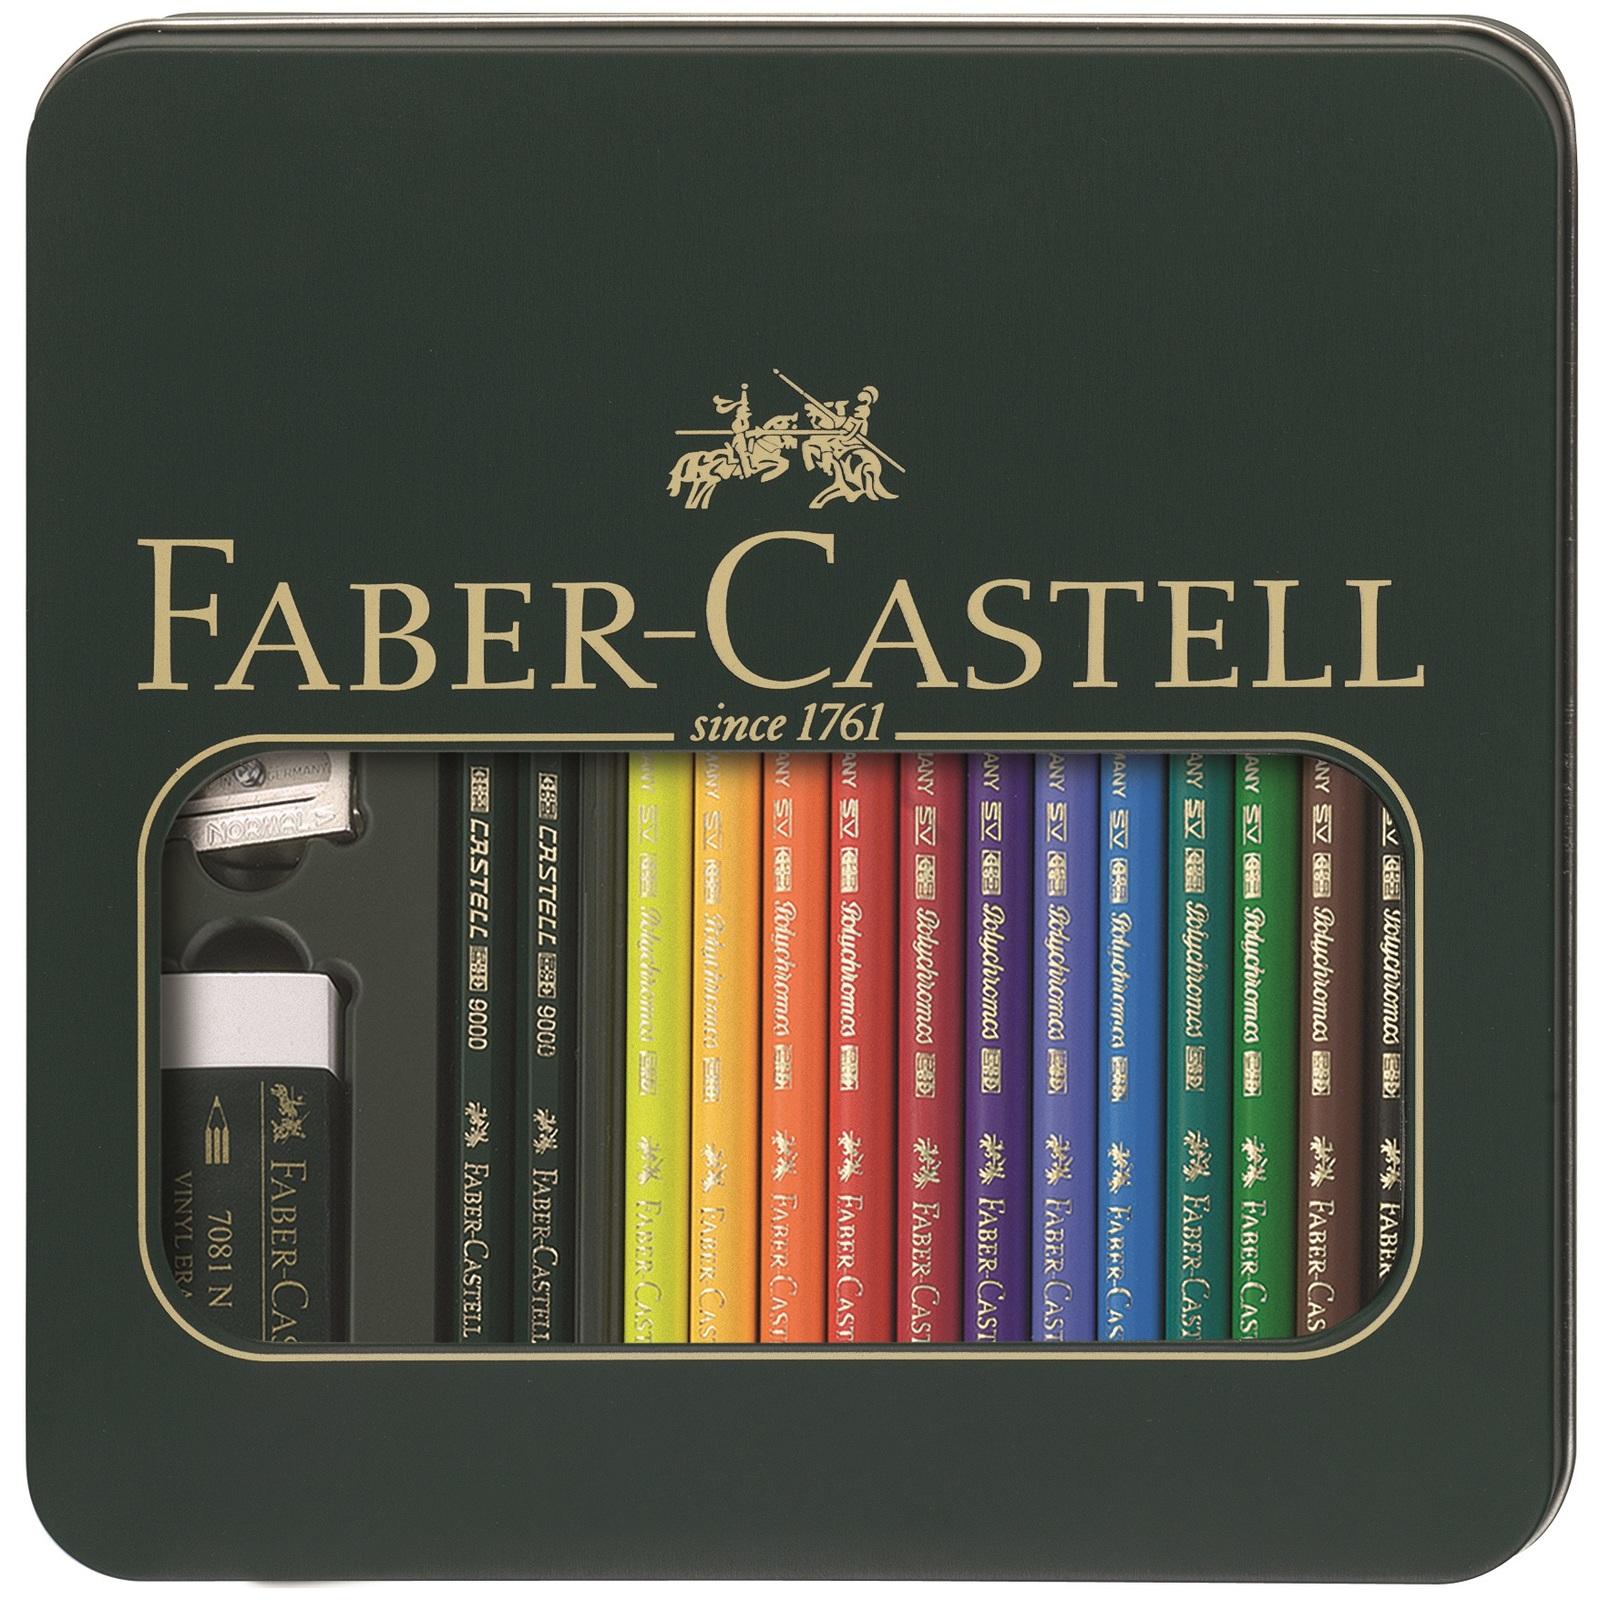 Faber-Castell: Polychromos Mixed Media Set image